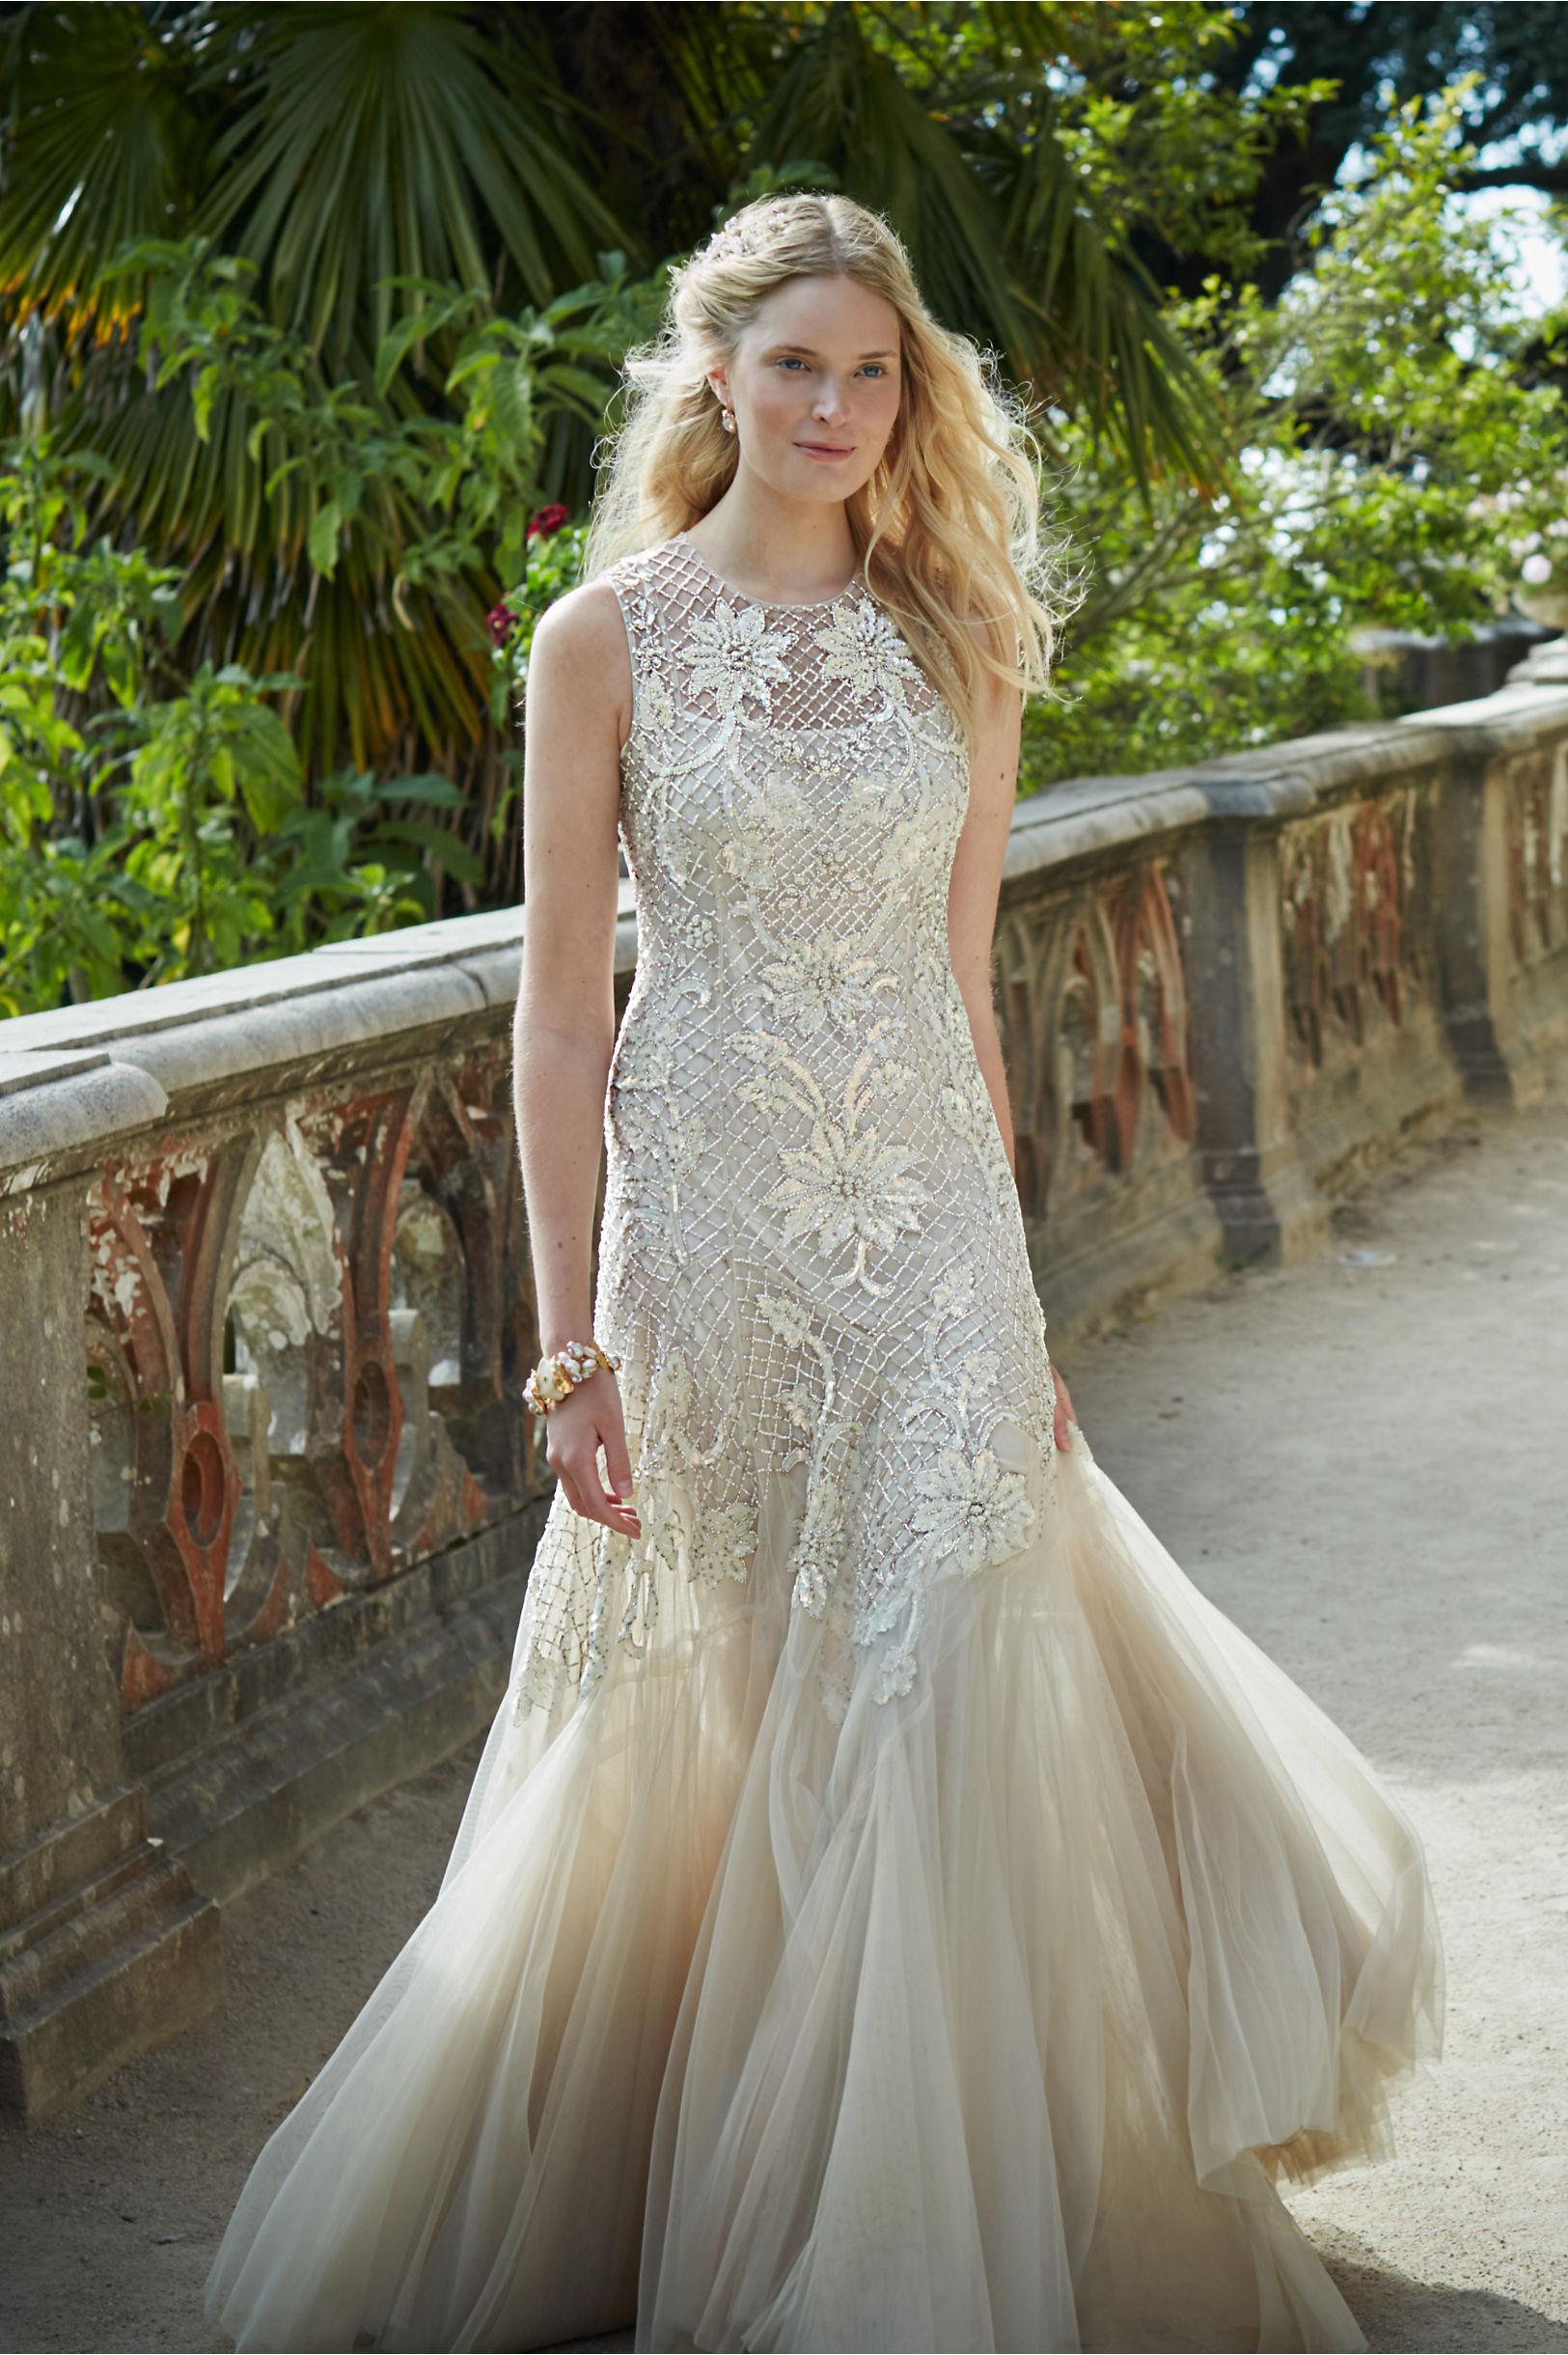 Twice Enchanted: Look 2 in Bride   BHLDN